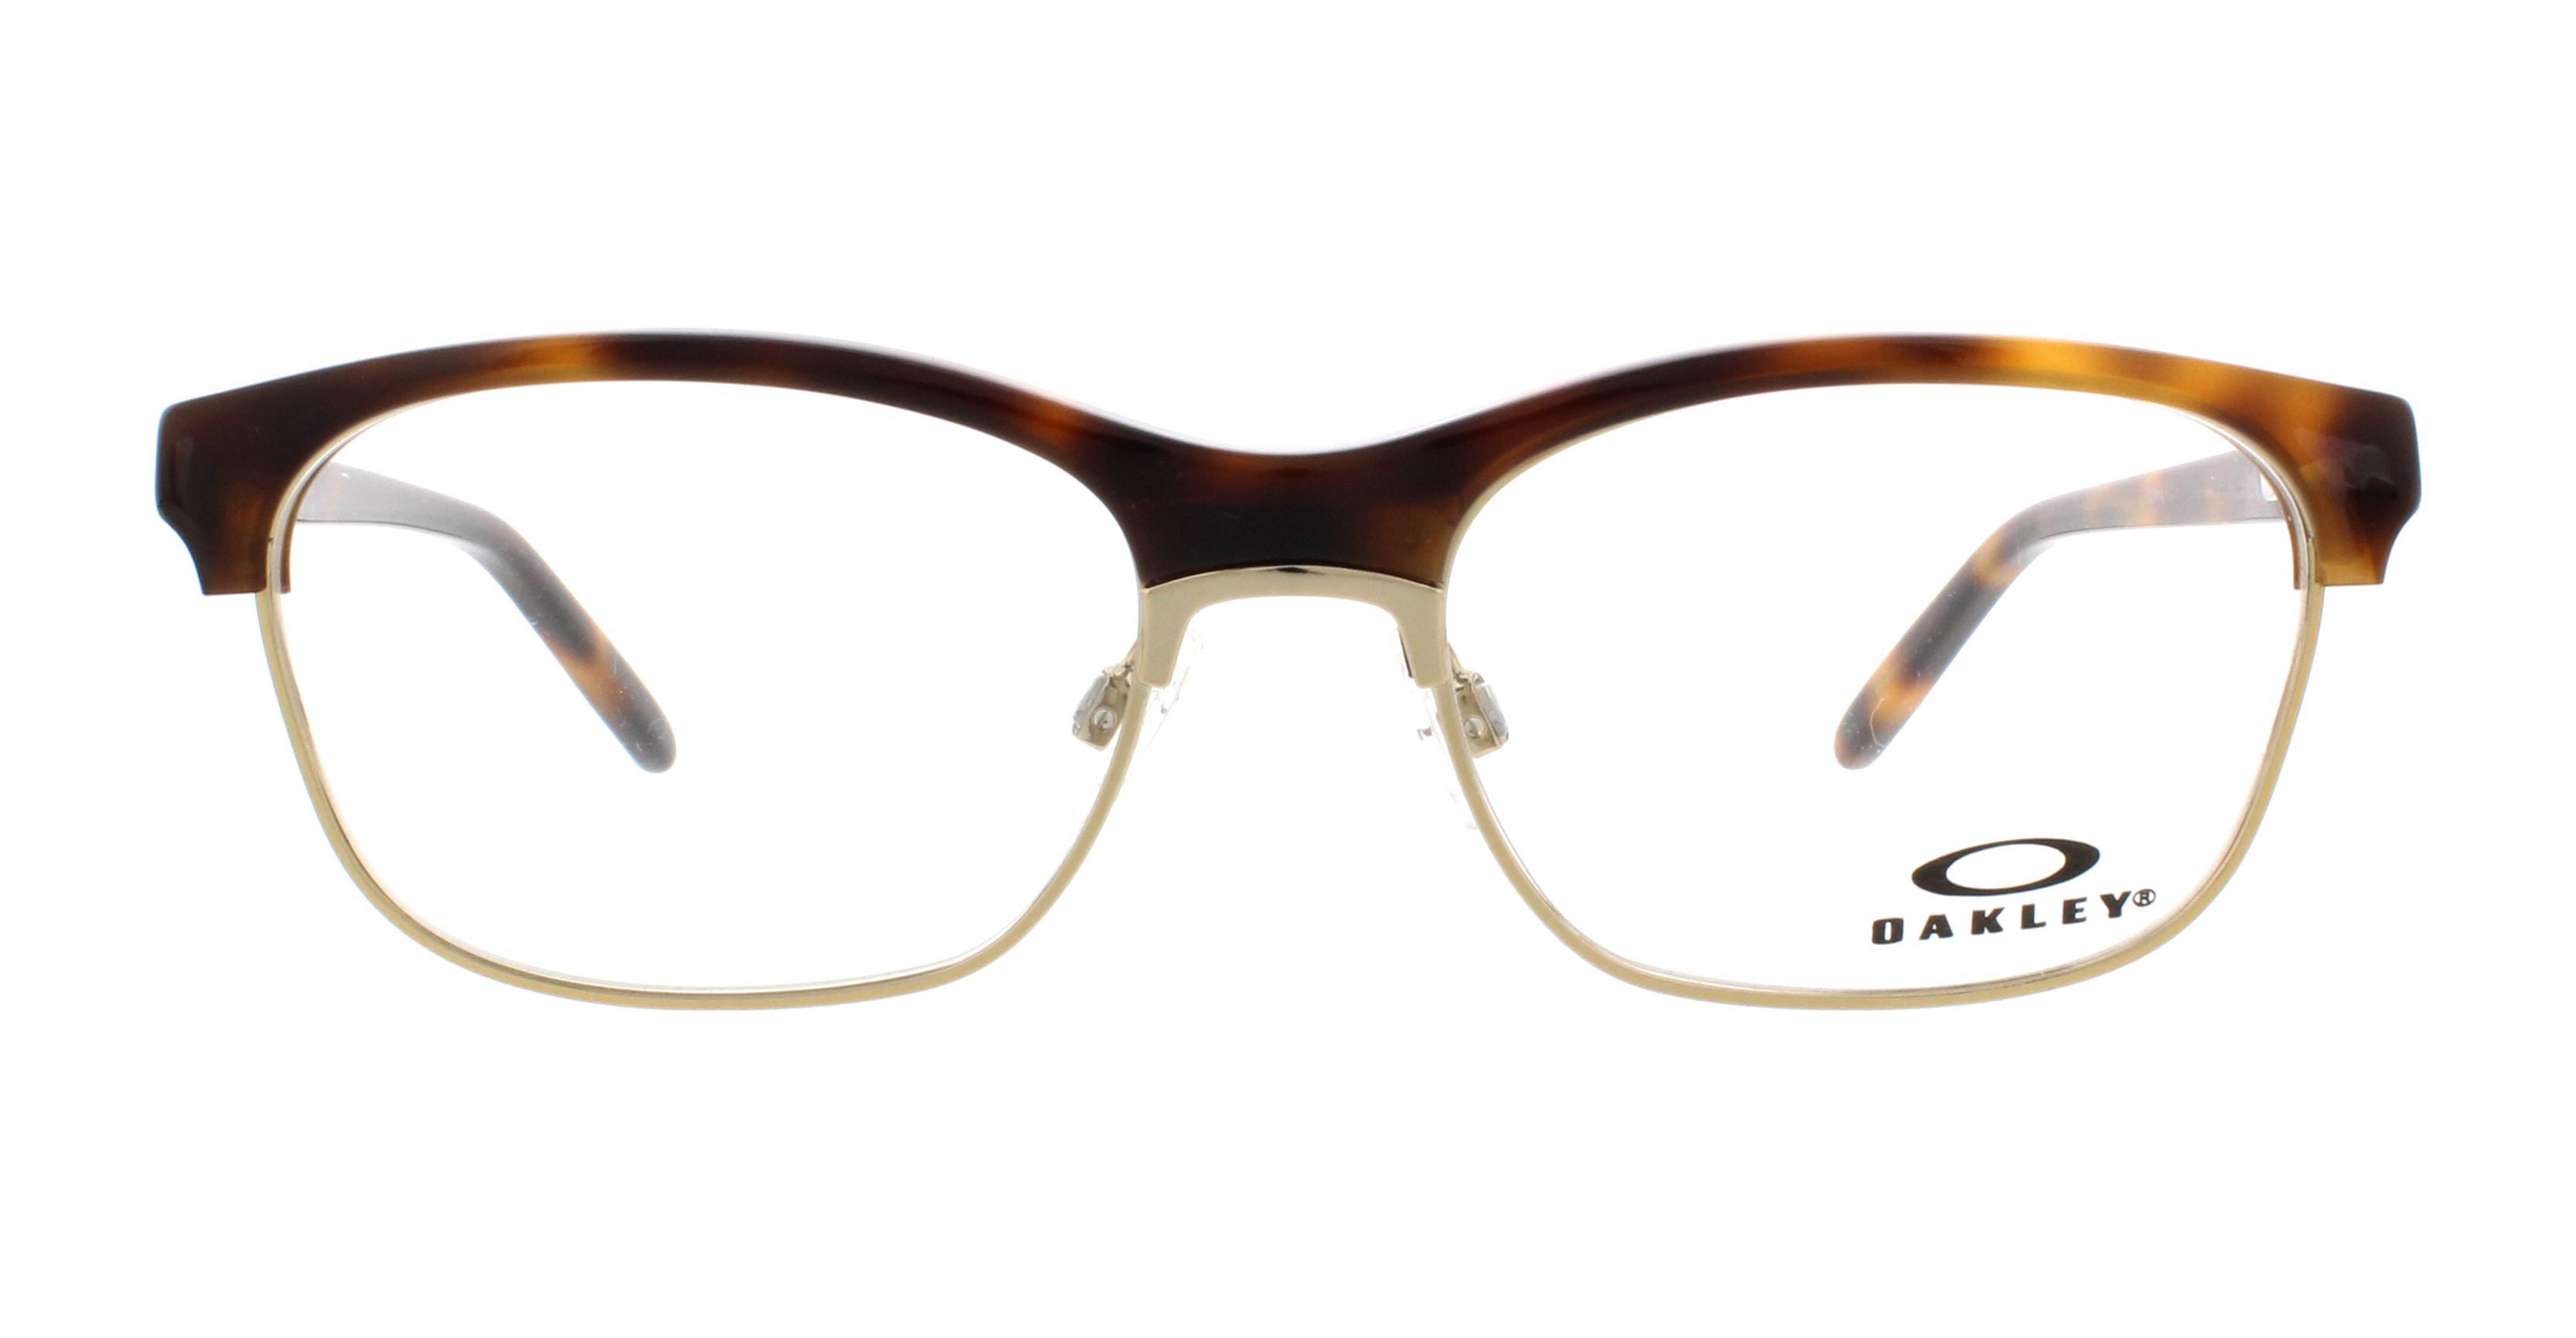 Designer Frames Outlet Oakley PONDER - What is invoice processing online glasses store